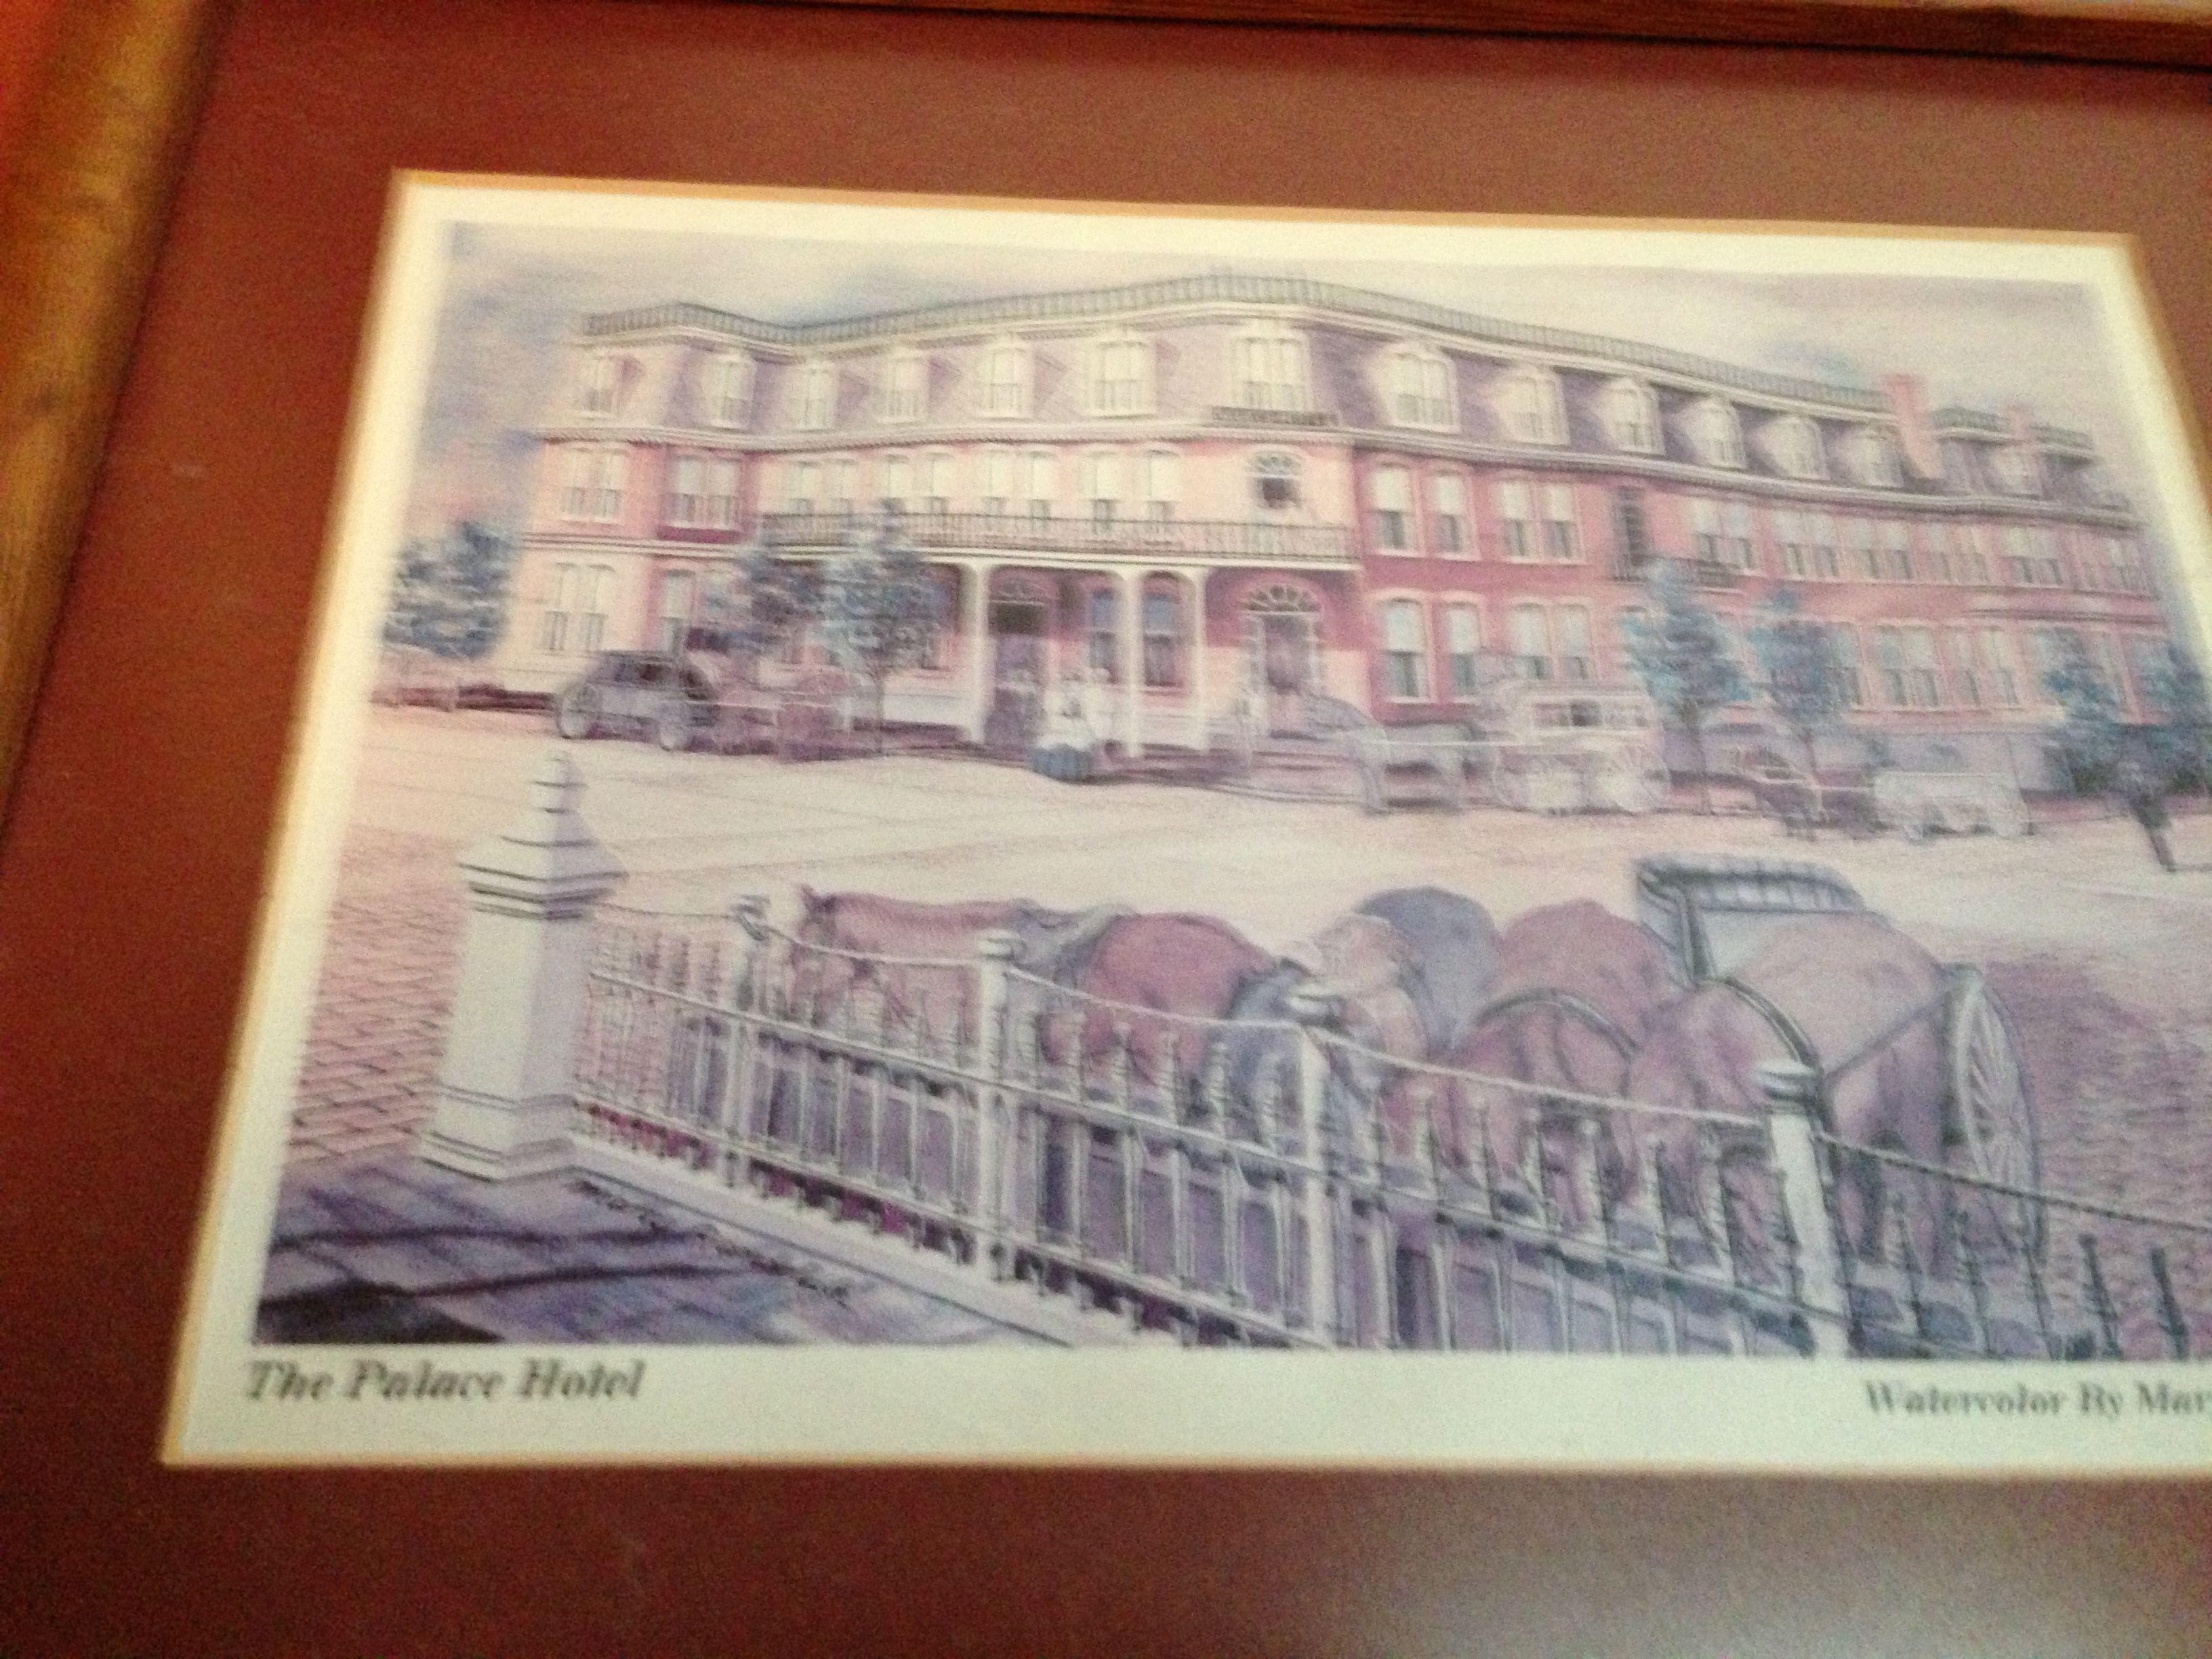 Palace Hotel Fulton Mo Elished 1870 My Pas Owned Operated